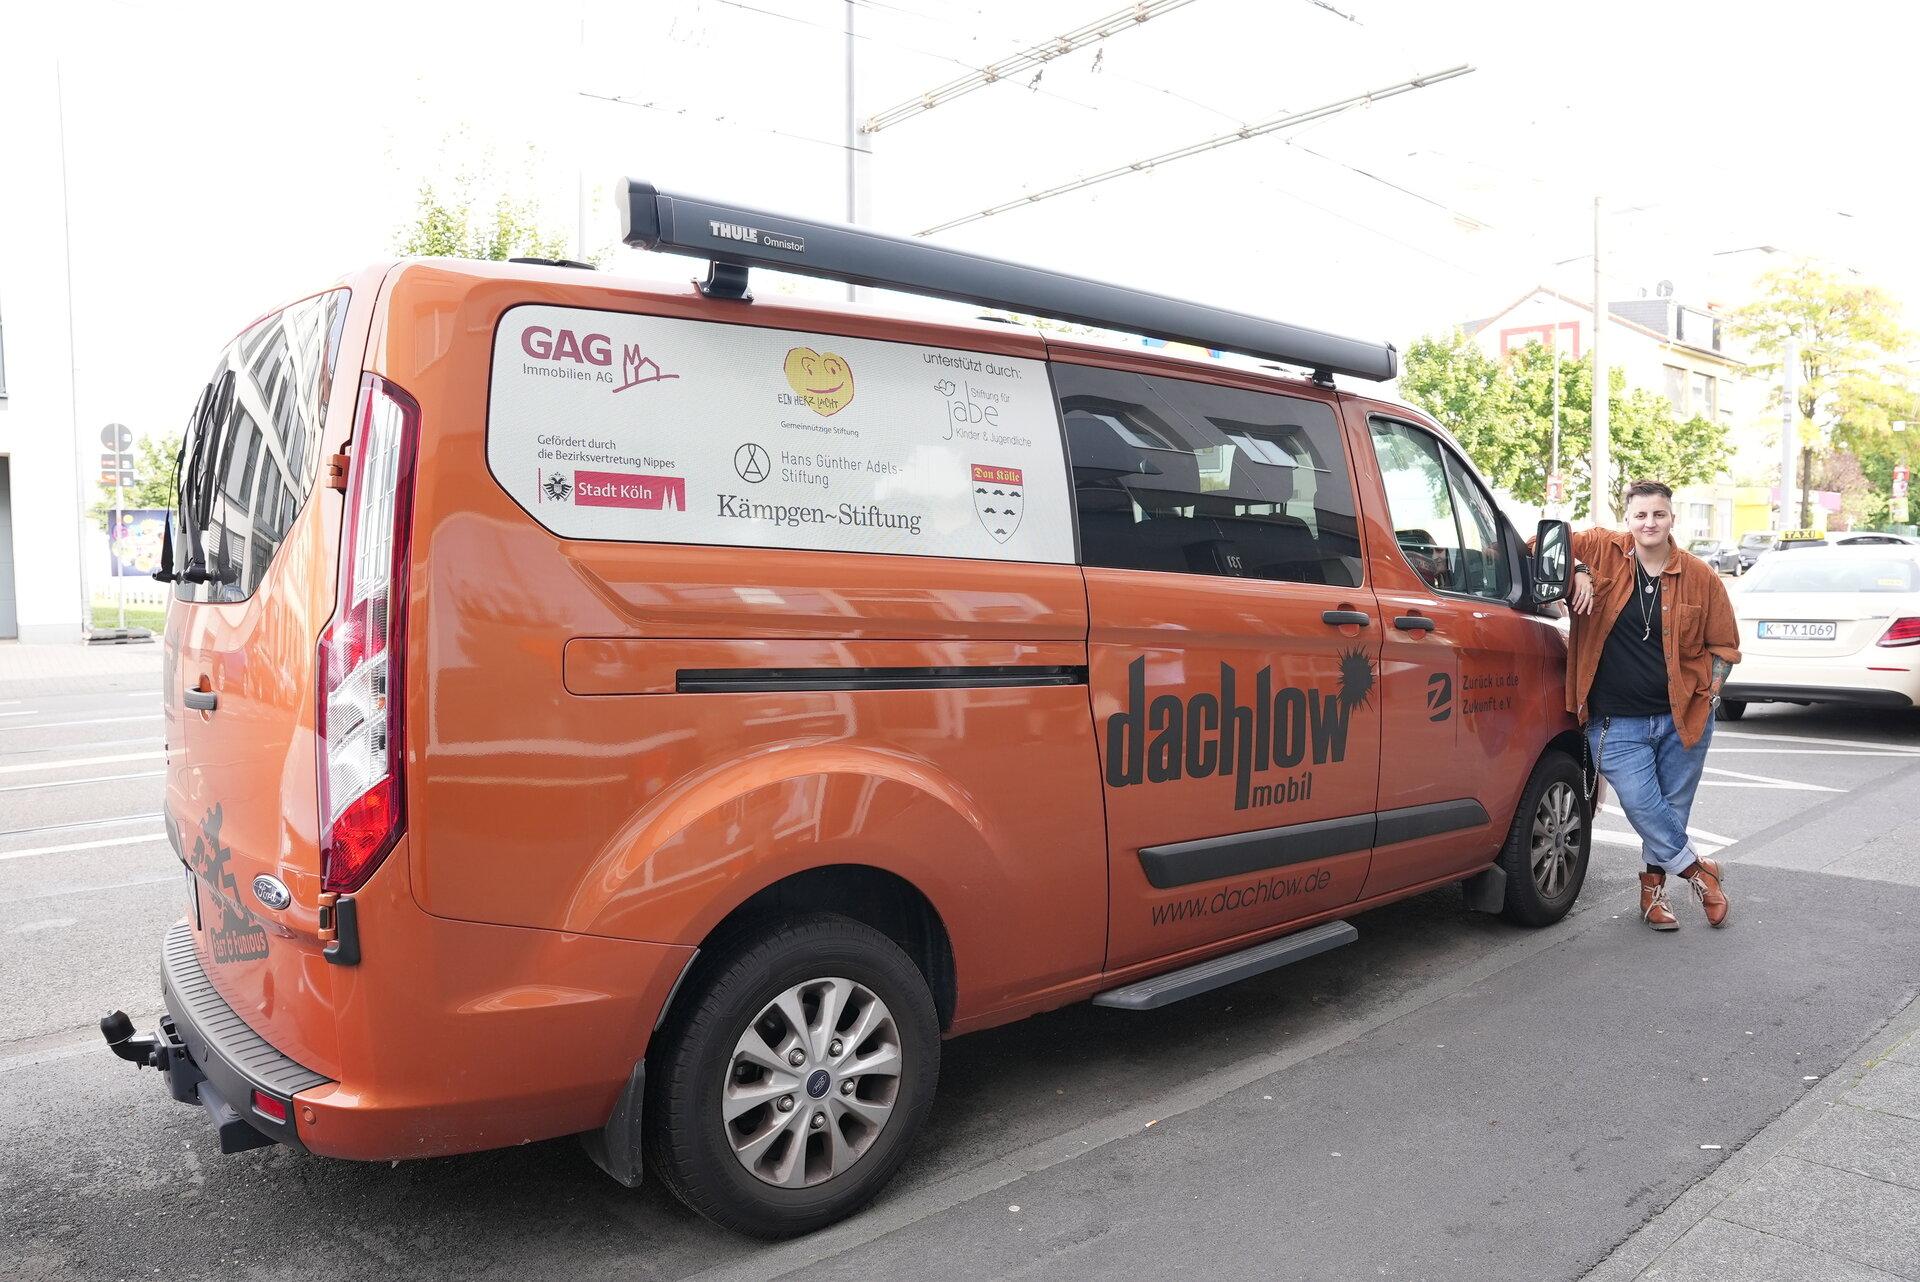 DachloW-Mobil